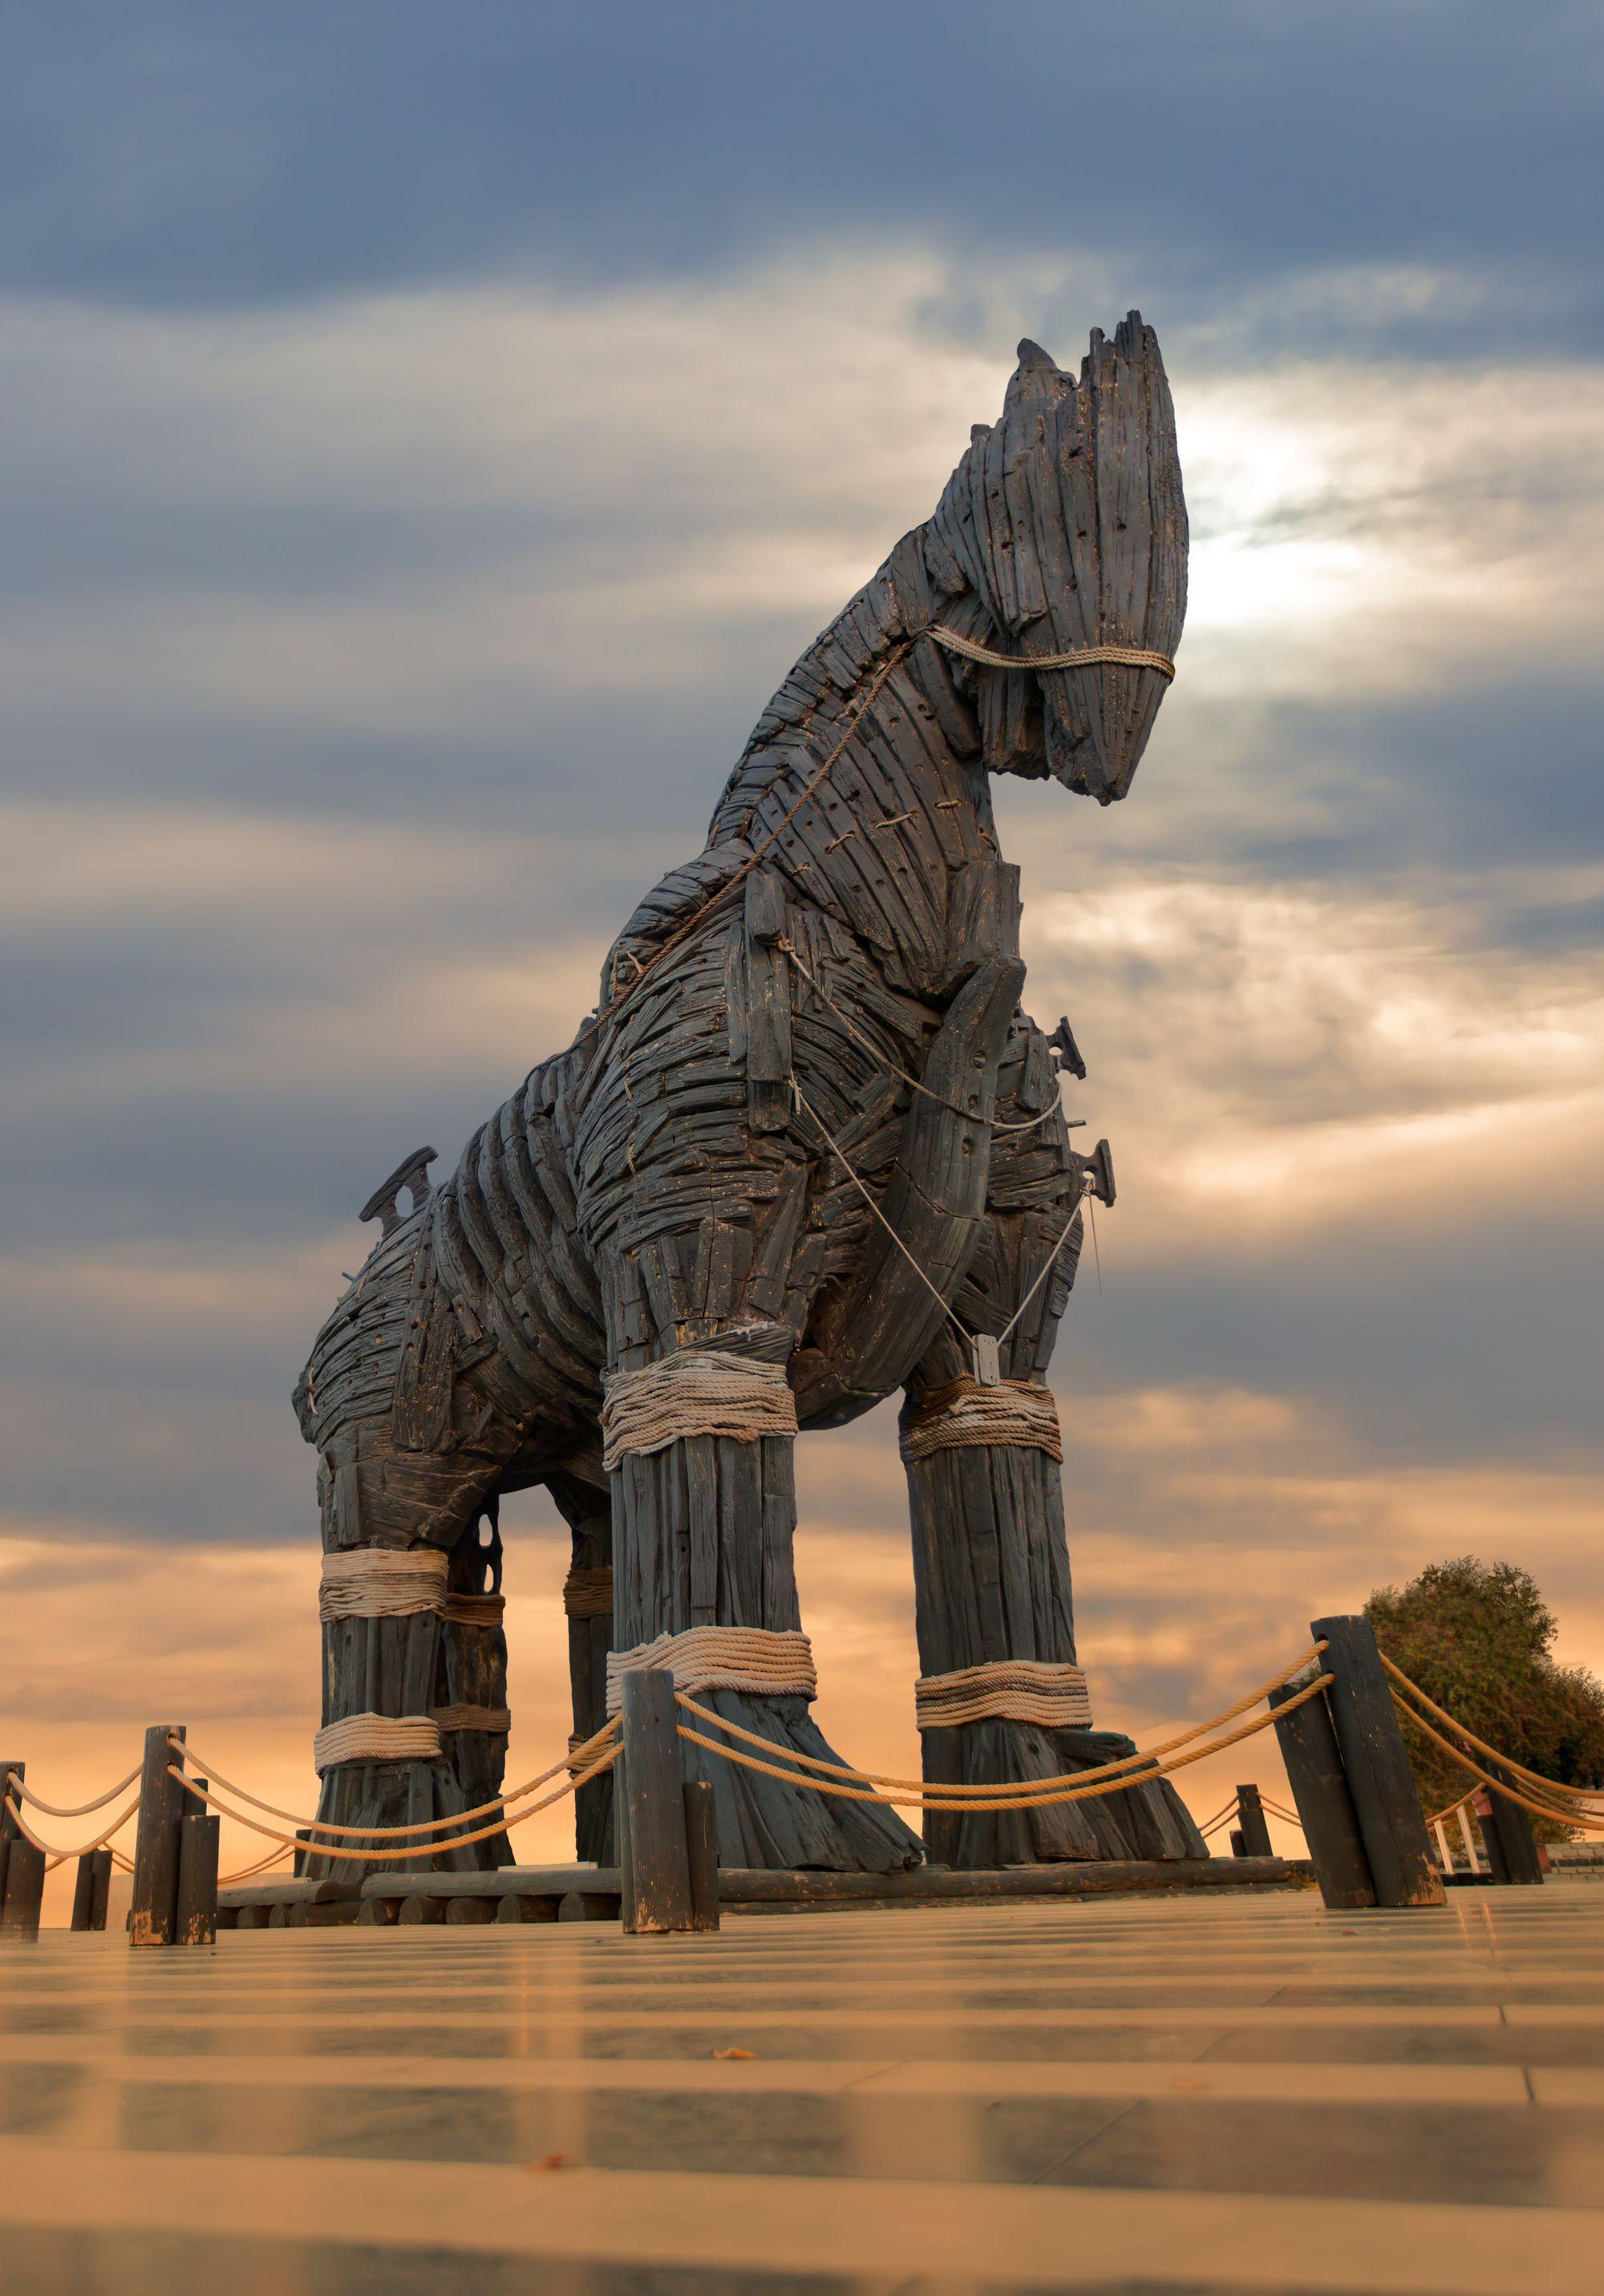 Trojan horse, Canakkale